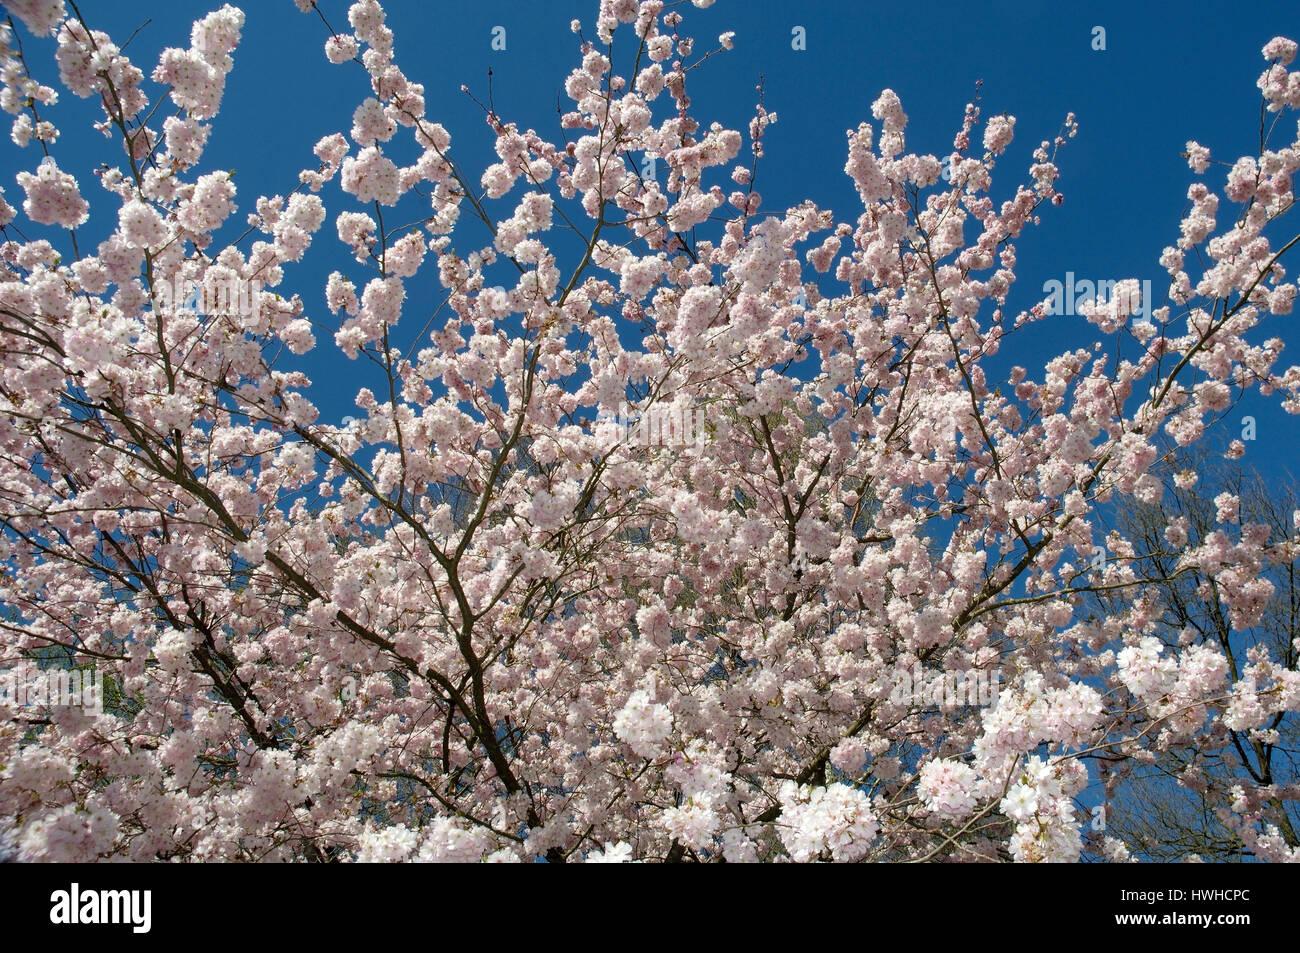 Accolade flowering cherry, Prunus sargentii x subhirtella, Adorning to cherry Accolade, Prunus sargentii x subhirtella - Stock Image